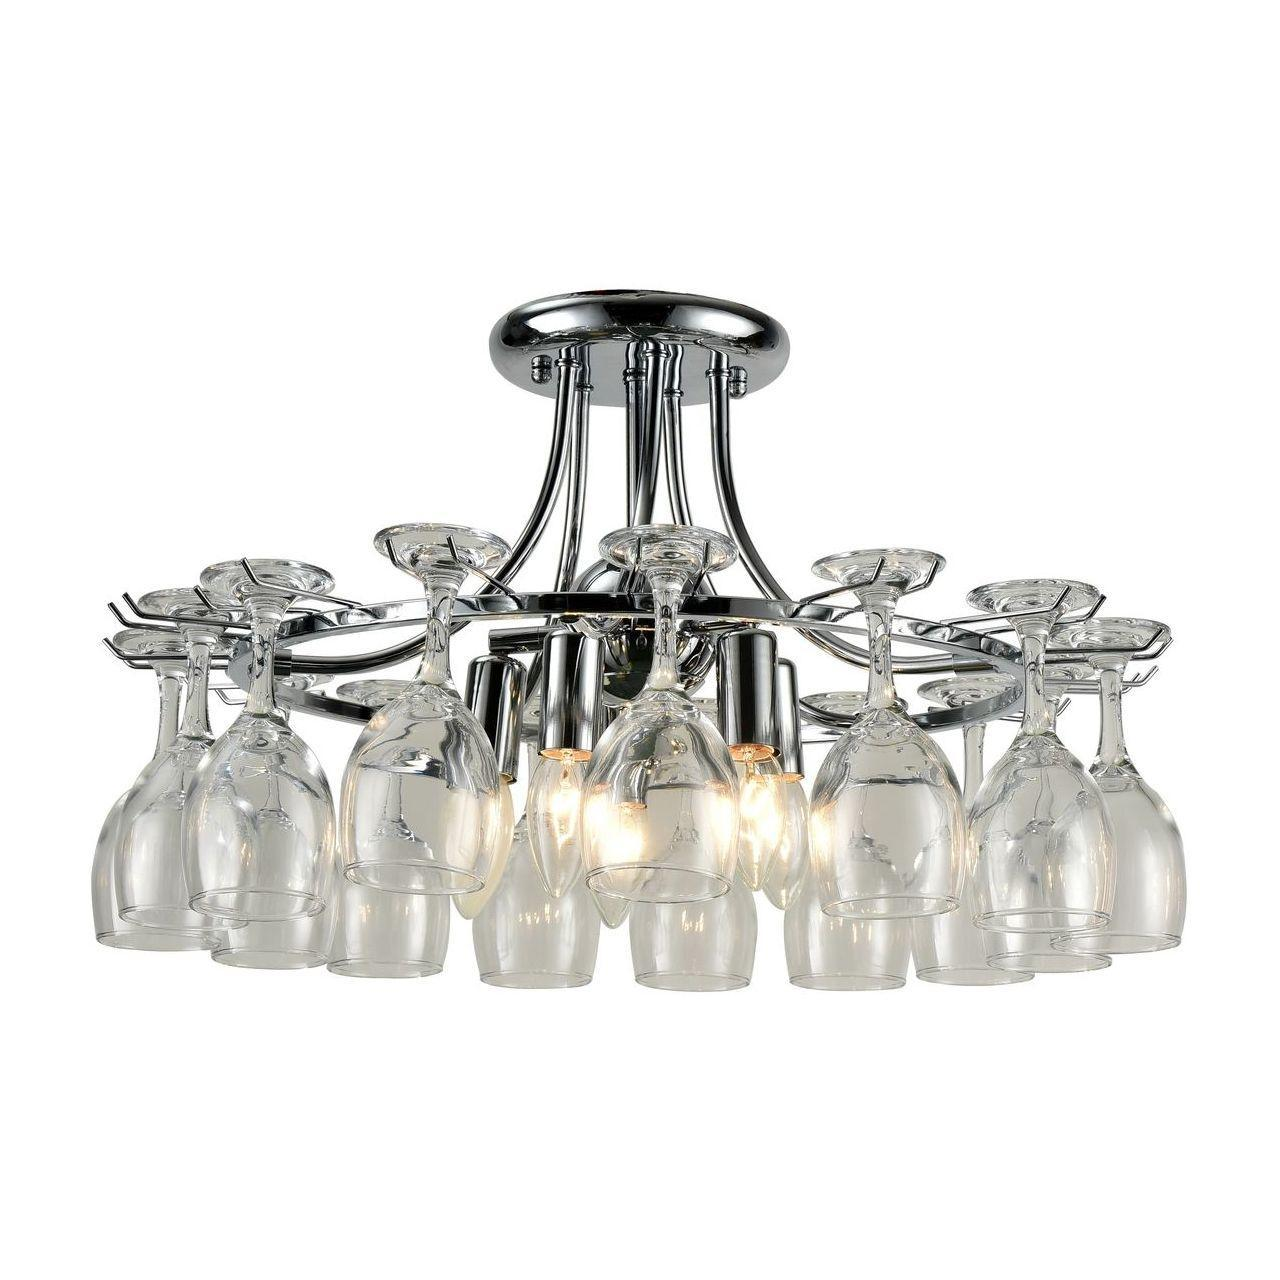 Люстра Arte Lamp A7043PL-5CC потолочная цена